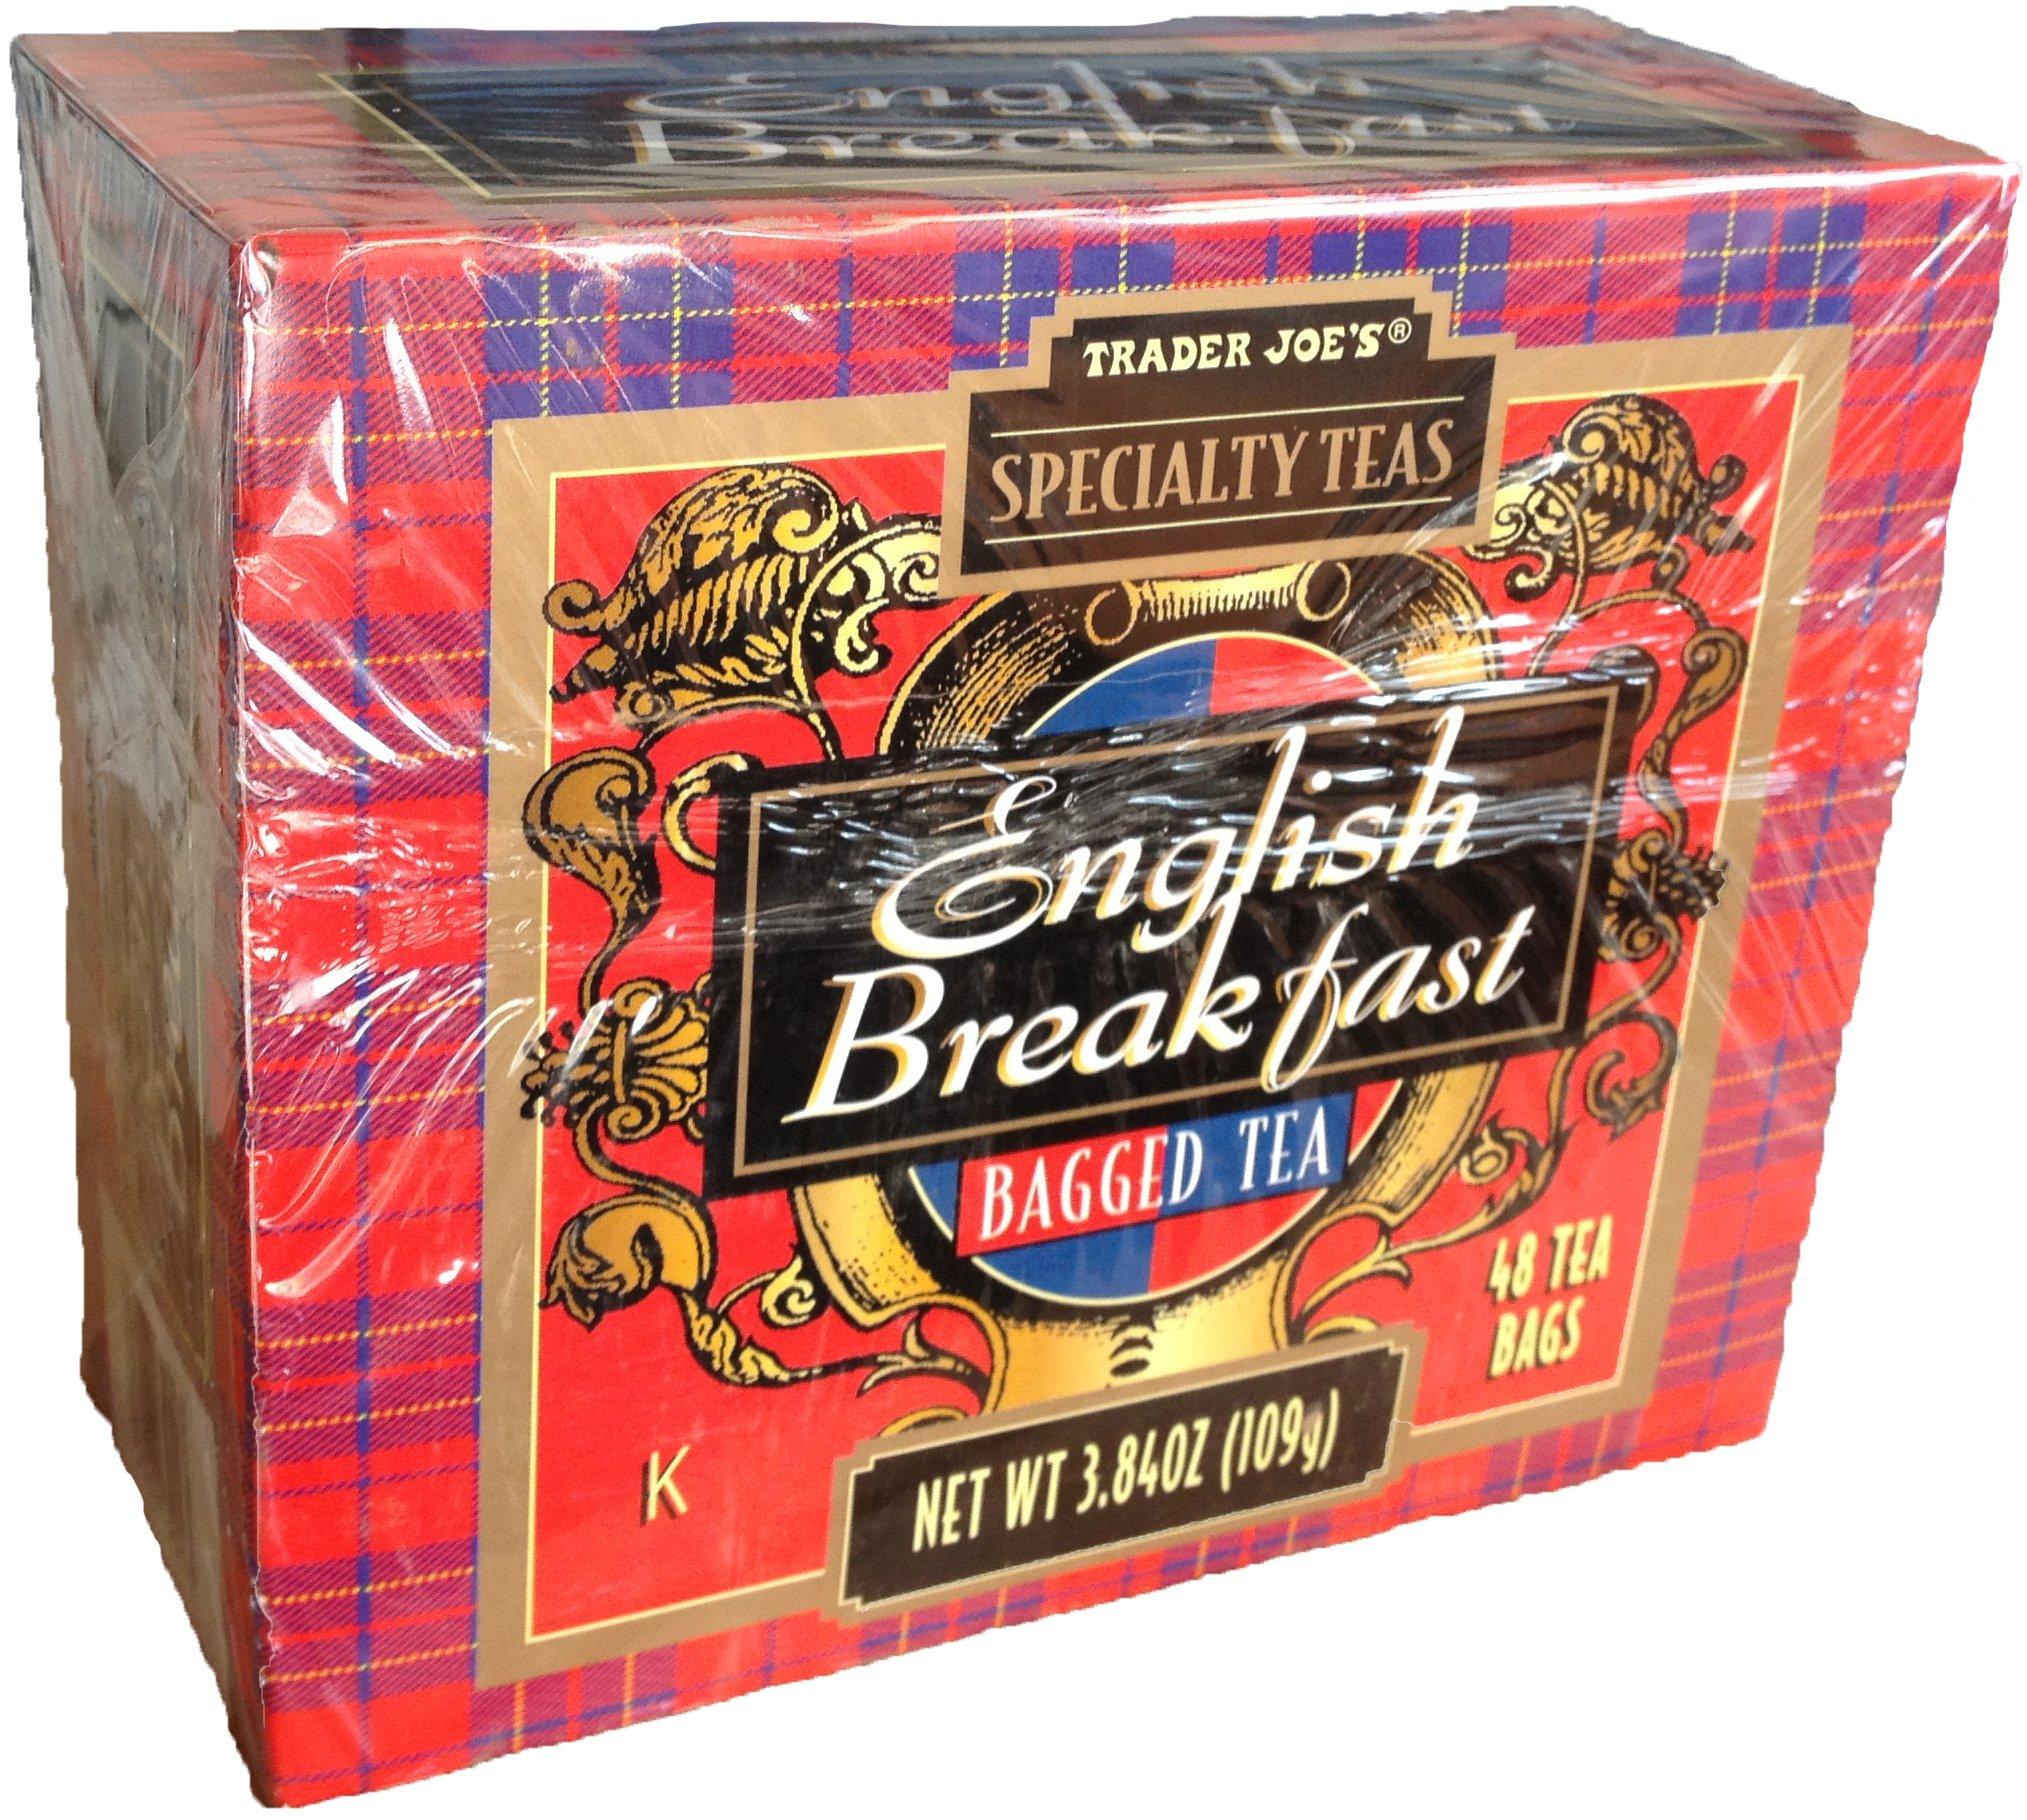 Amazon.com : Trader Joe's Specialty Teas Green Tea 48 Tea